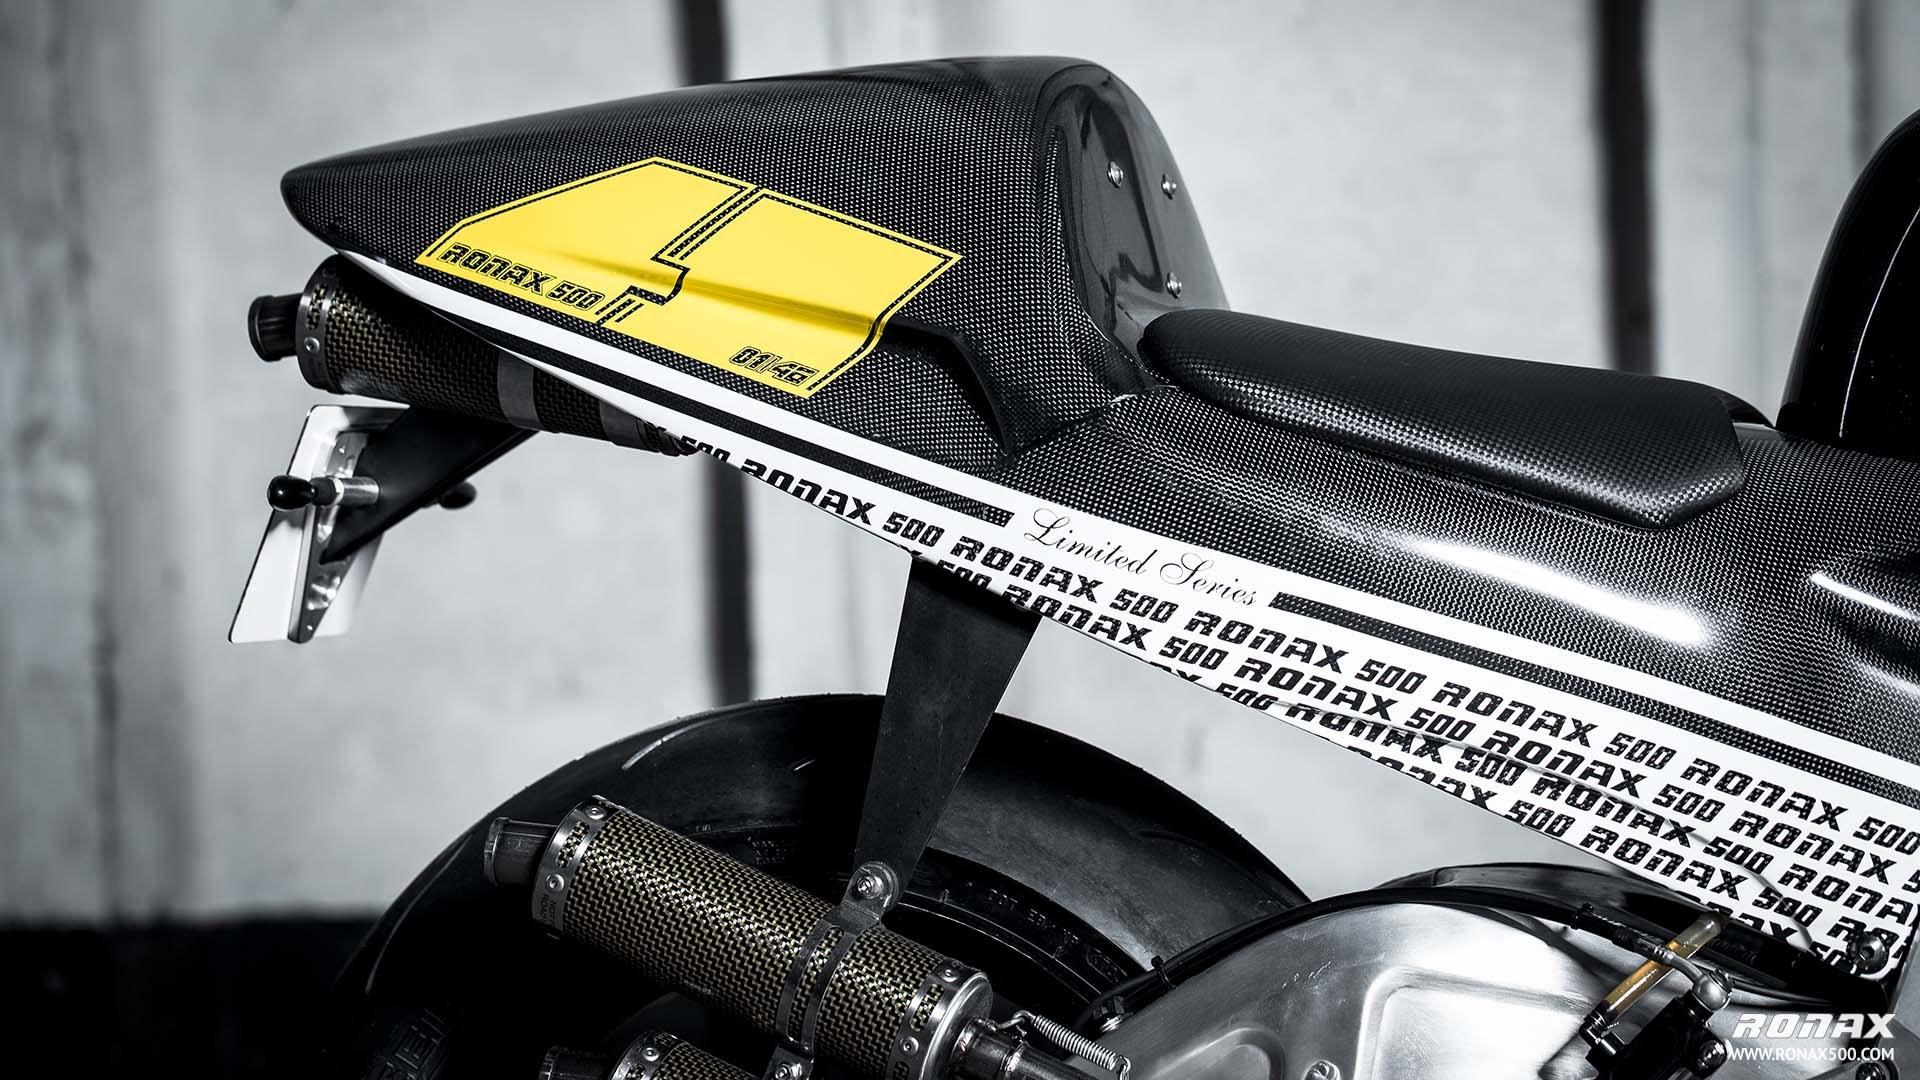 News : Ronax 500, V4, 2 stroke powerhorse - Adrenaline Culture